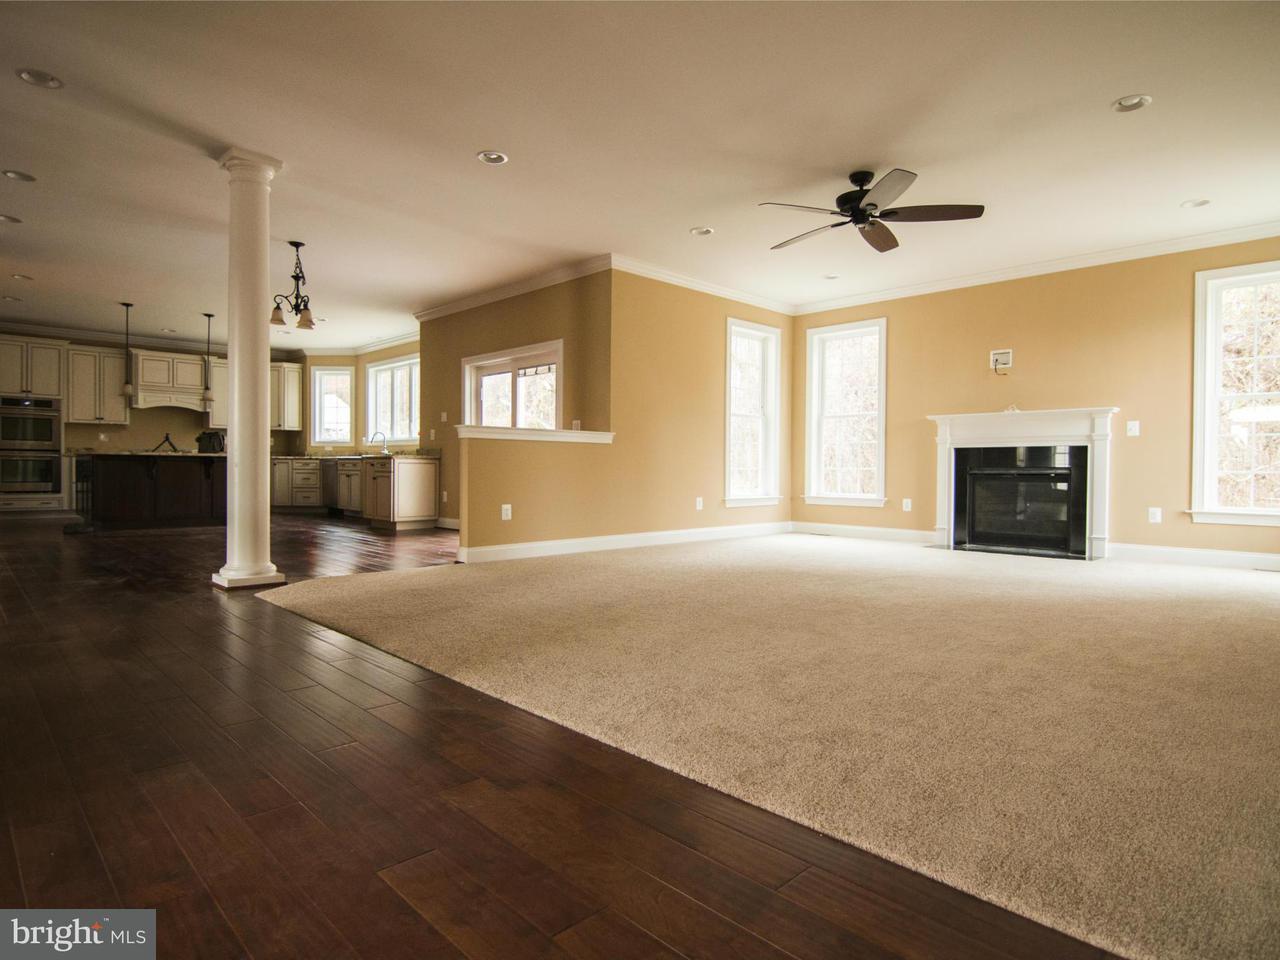 Additional photo for property listing at 1336R ROCK RIDGE Road 1336R ROCK RIDGE Road Jarrettsville, Maryland 21084 Estados Unidos